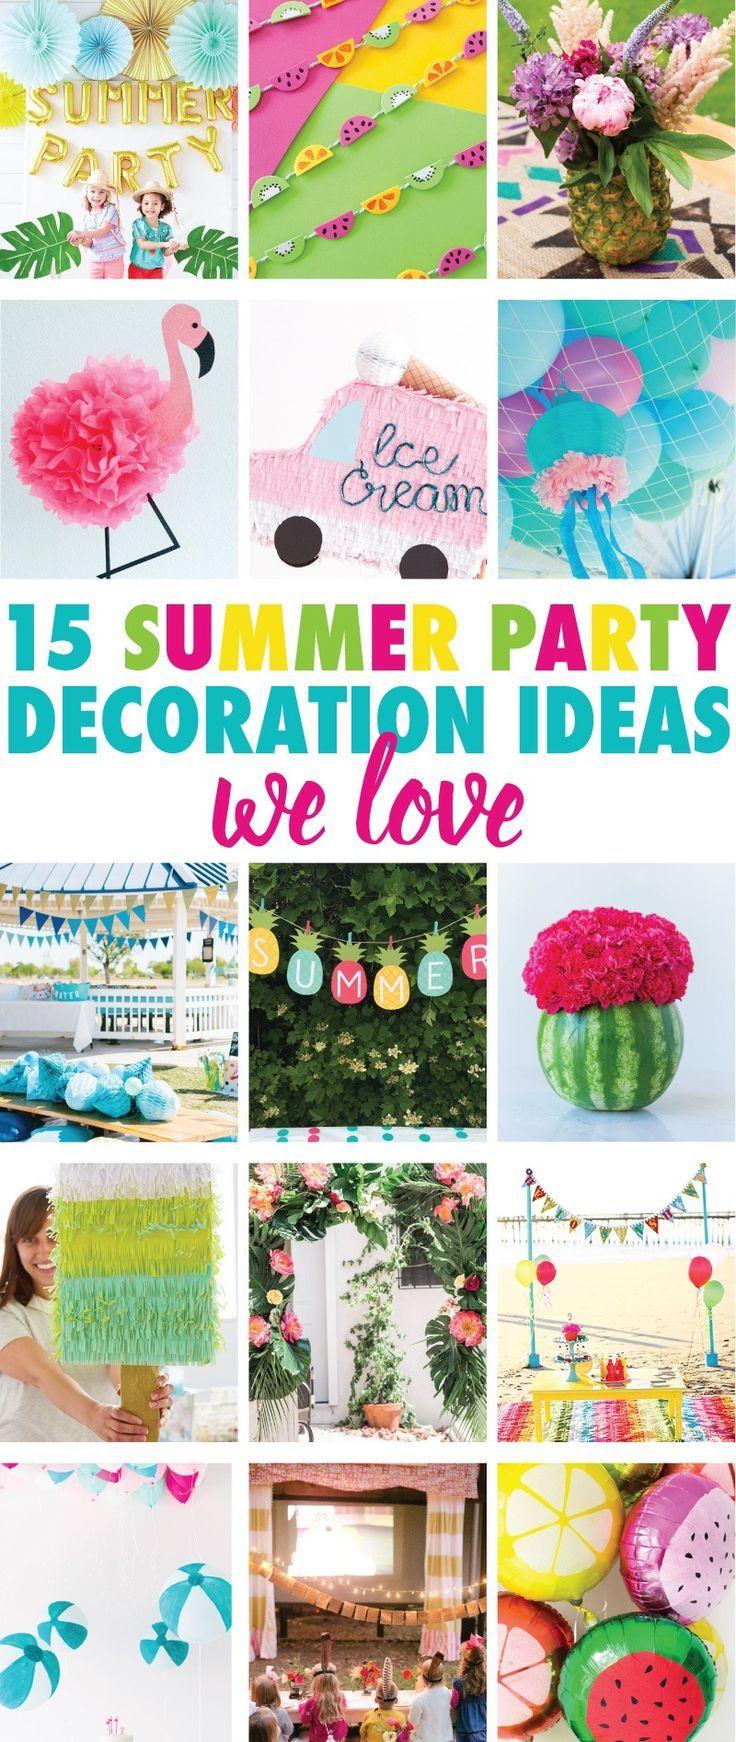 Beach Birthday Diy Party Centerpiece Summer Party Decorations